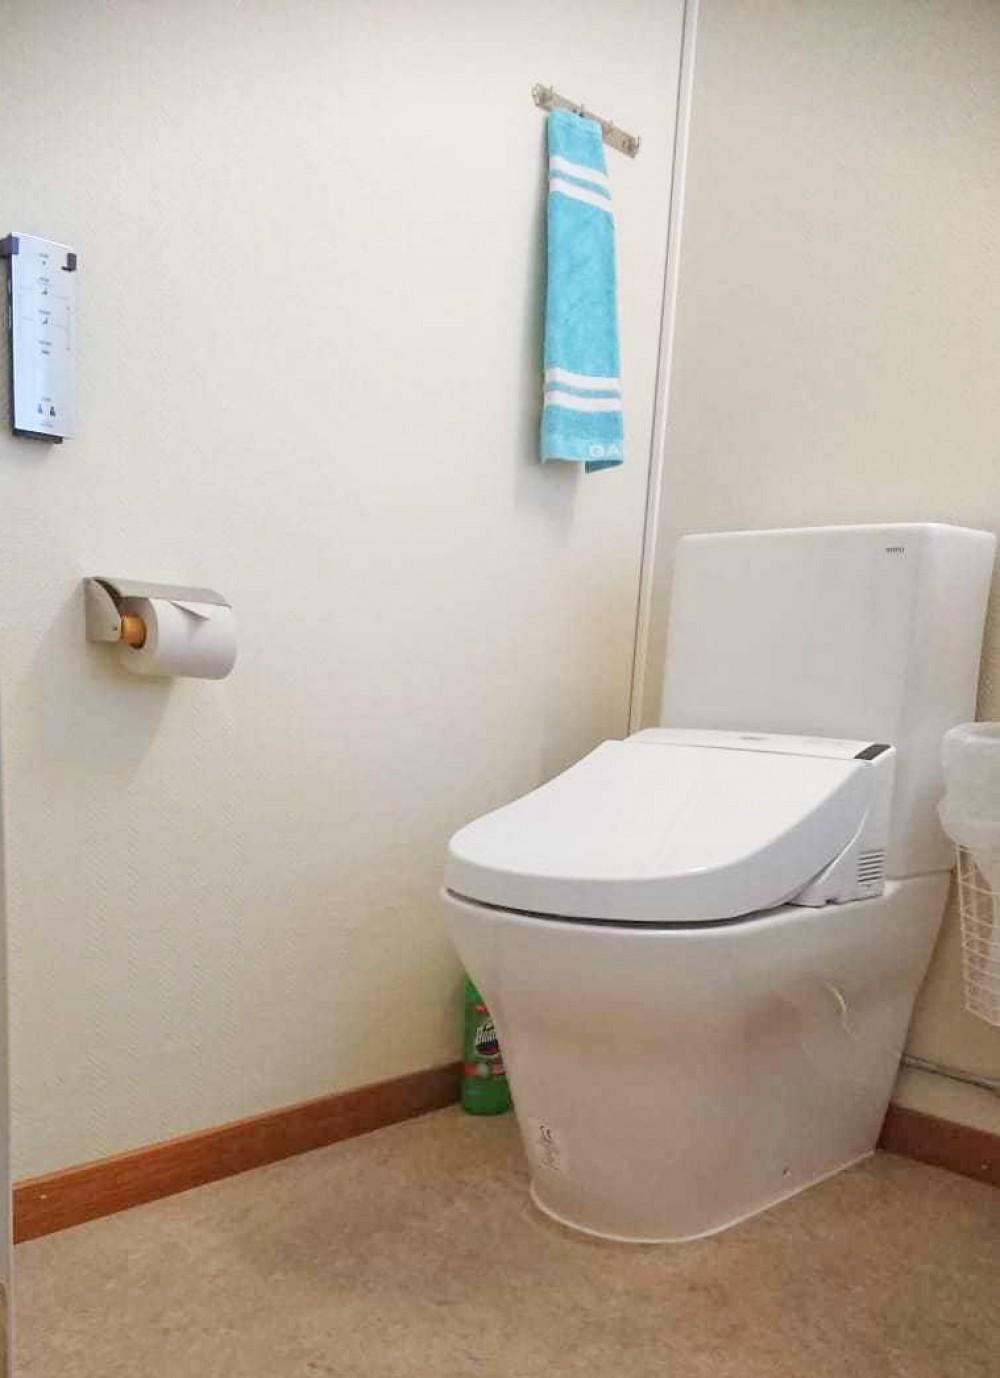 toto washlet gl 2.0 standkombination